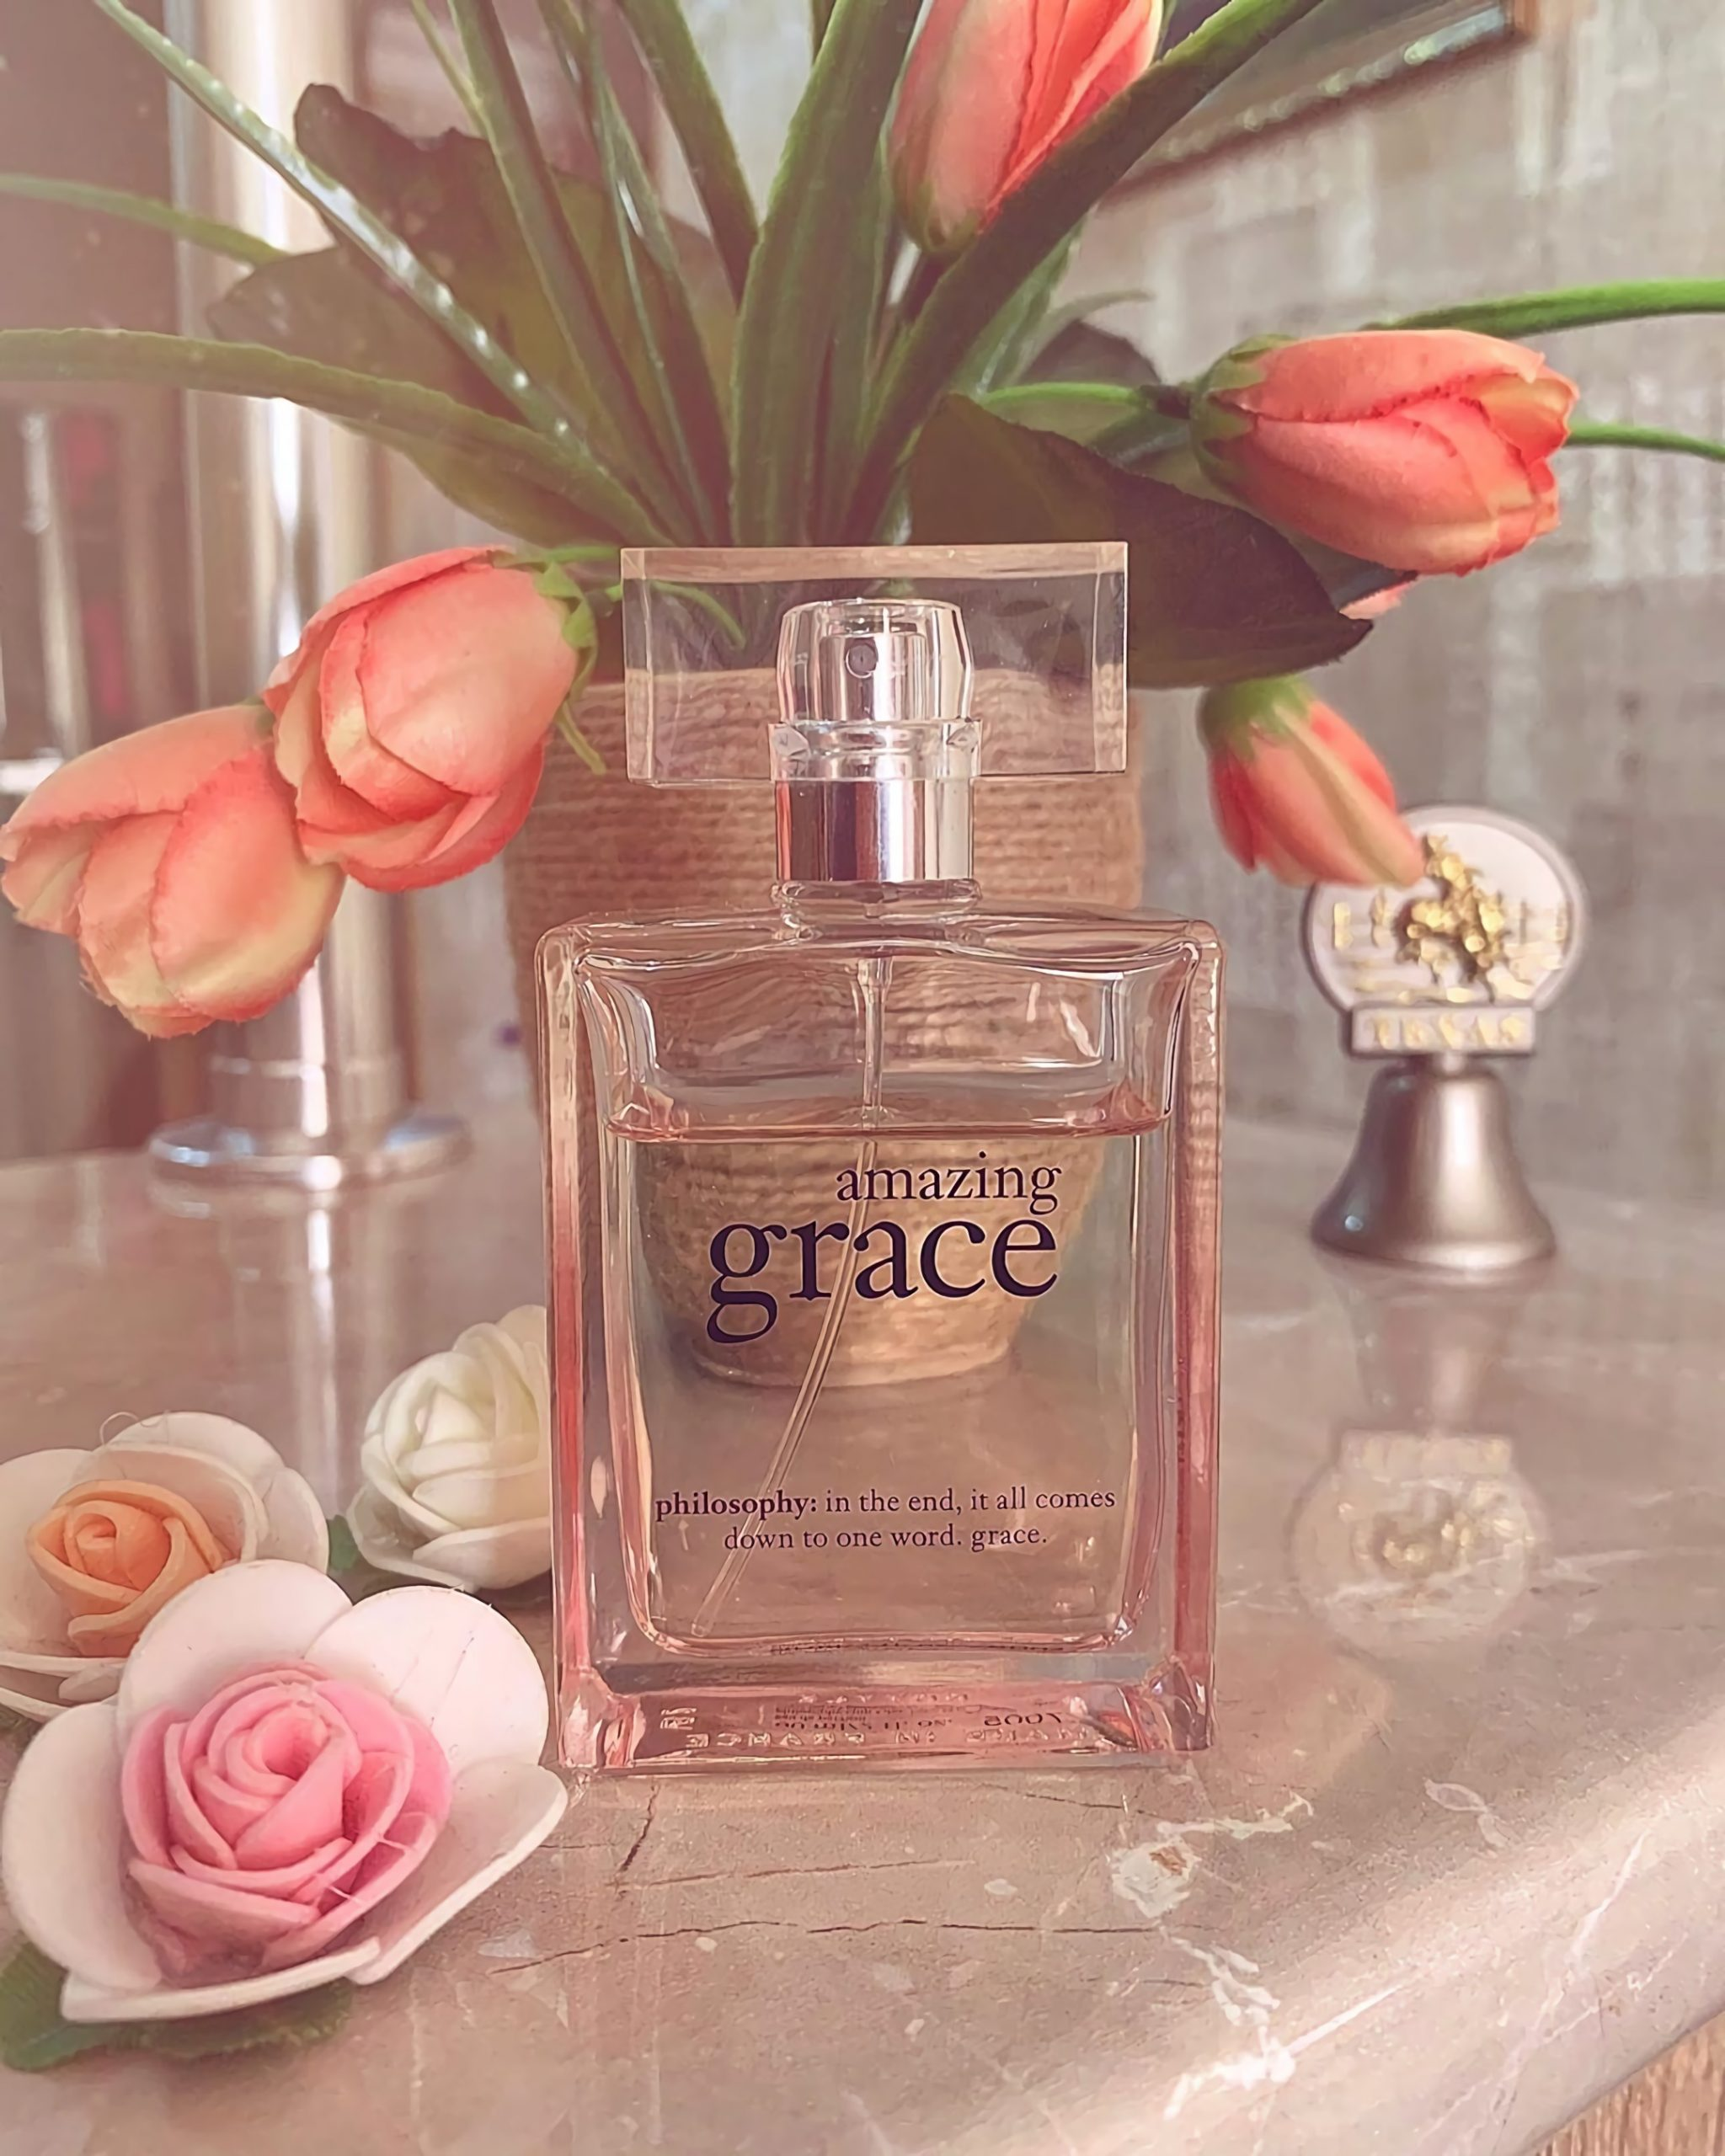 стойкий парфюм с освежающим ароматом Philosophy Amazing Grace